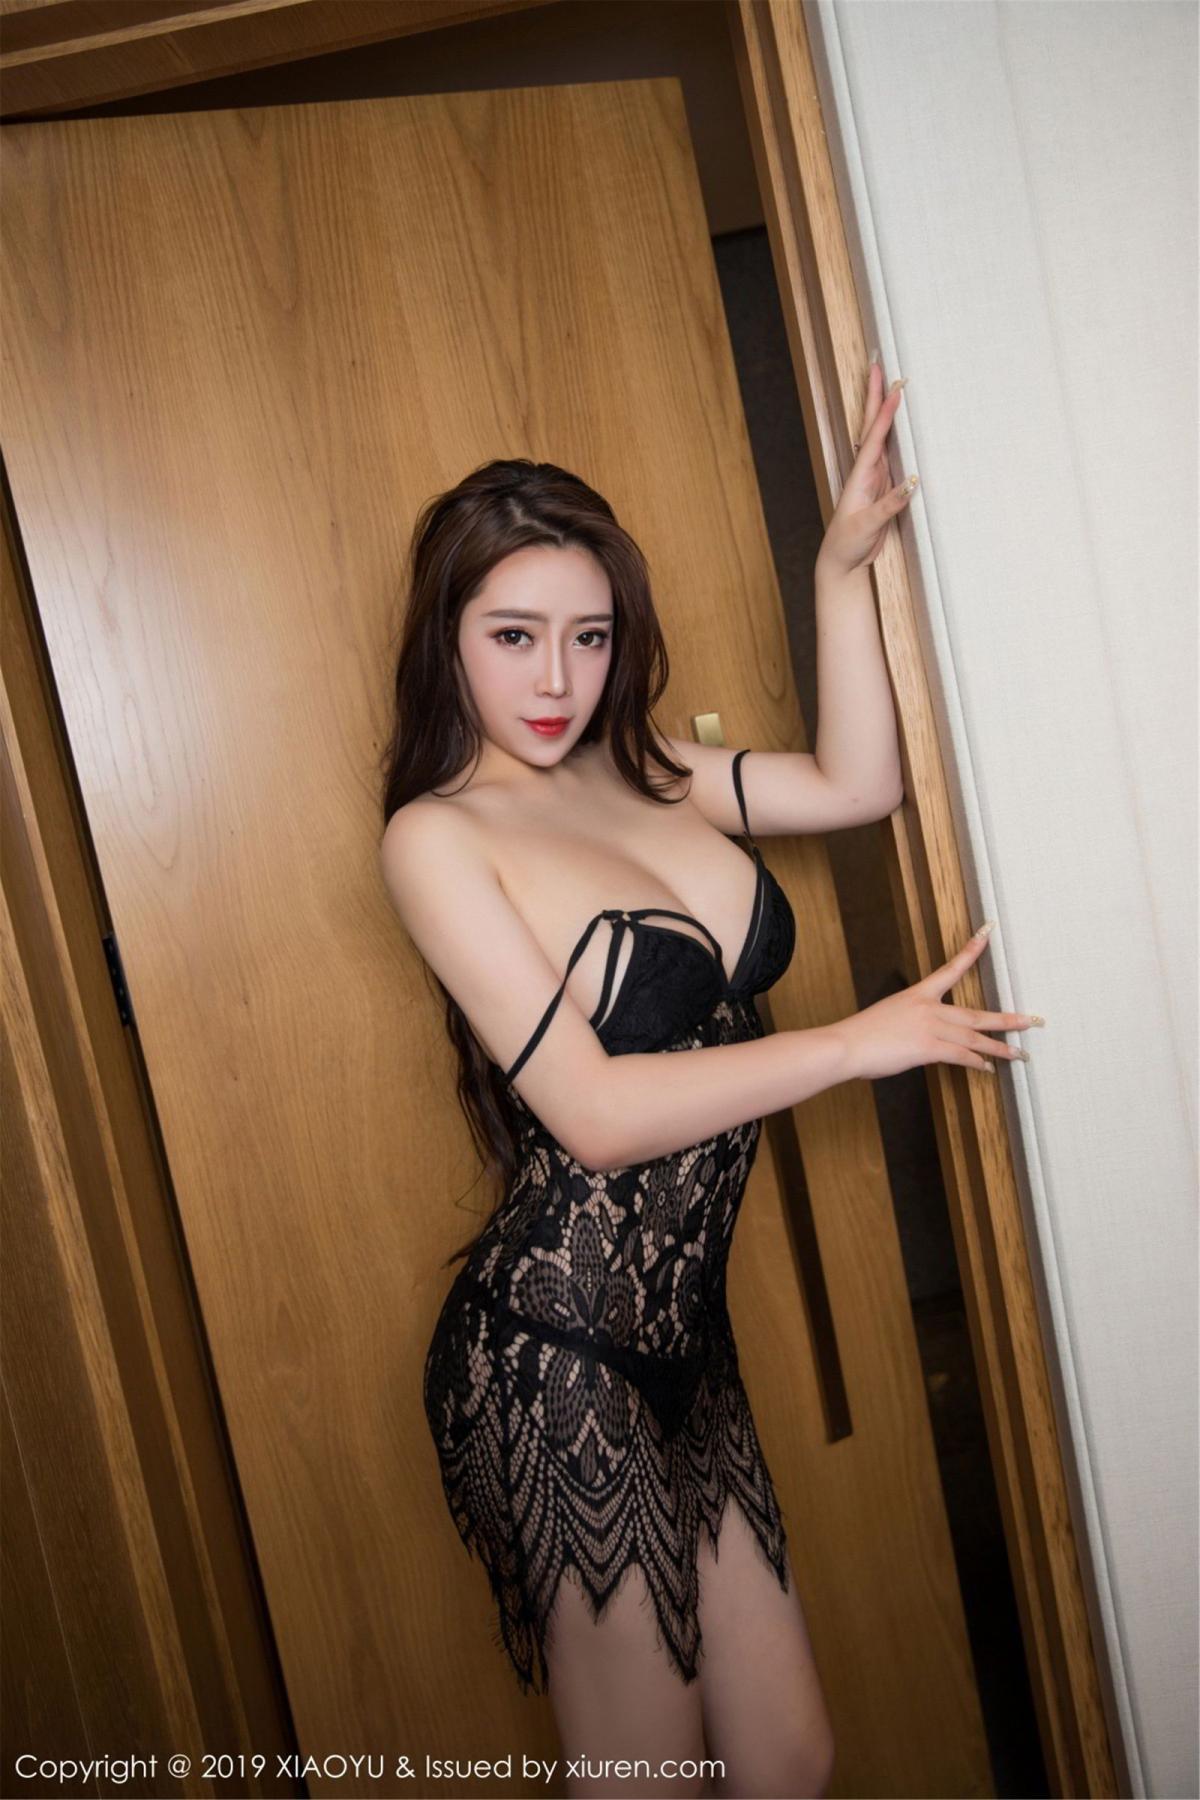 [XiaoYu] Vol.058 Miki Tu 10P, Miki Tu, XiaoYu